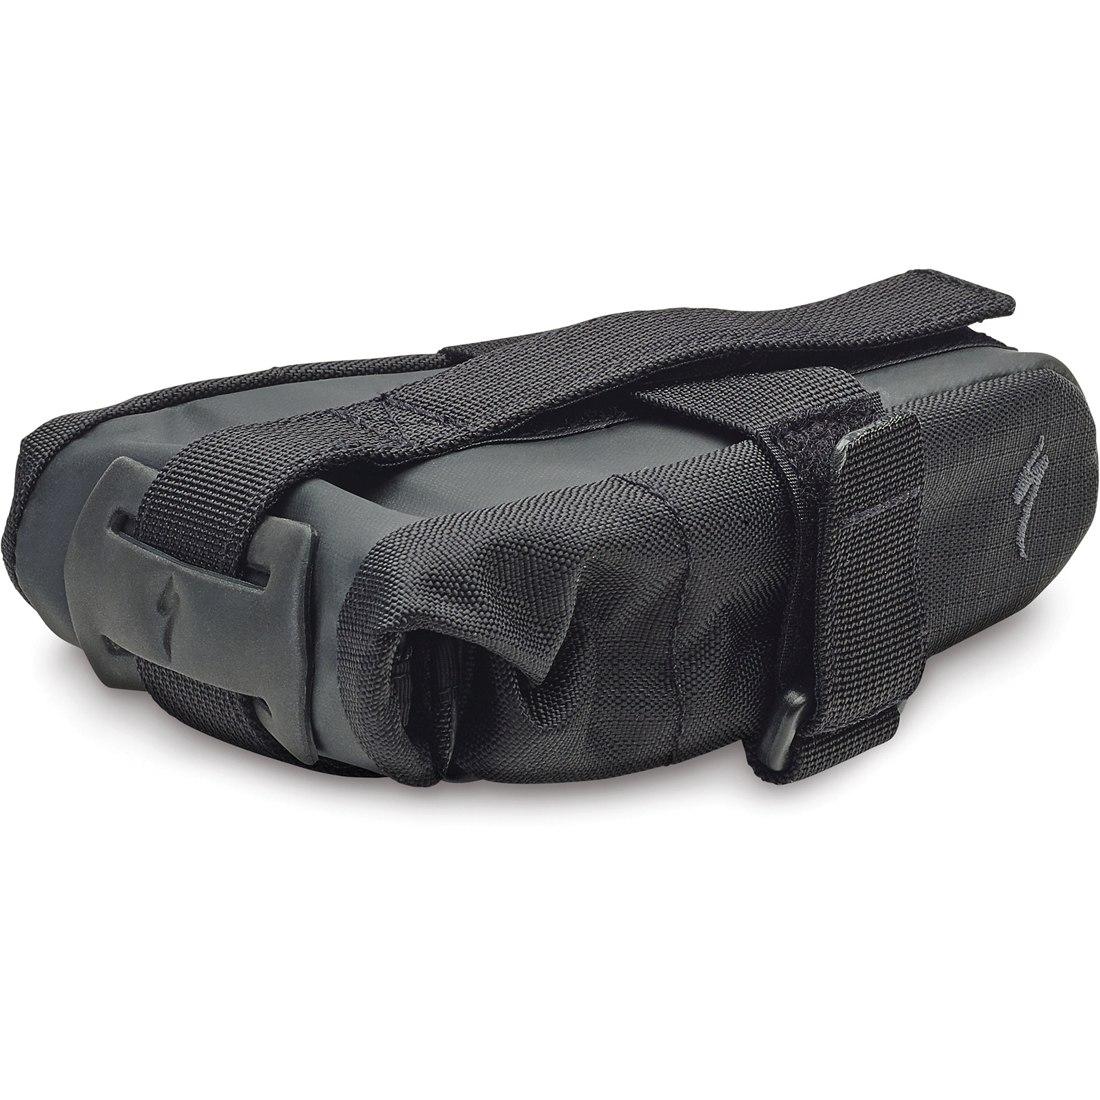 Specialized Seat Pack – Medium Saddle Bag - Black